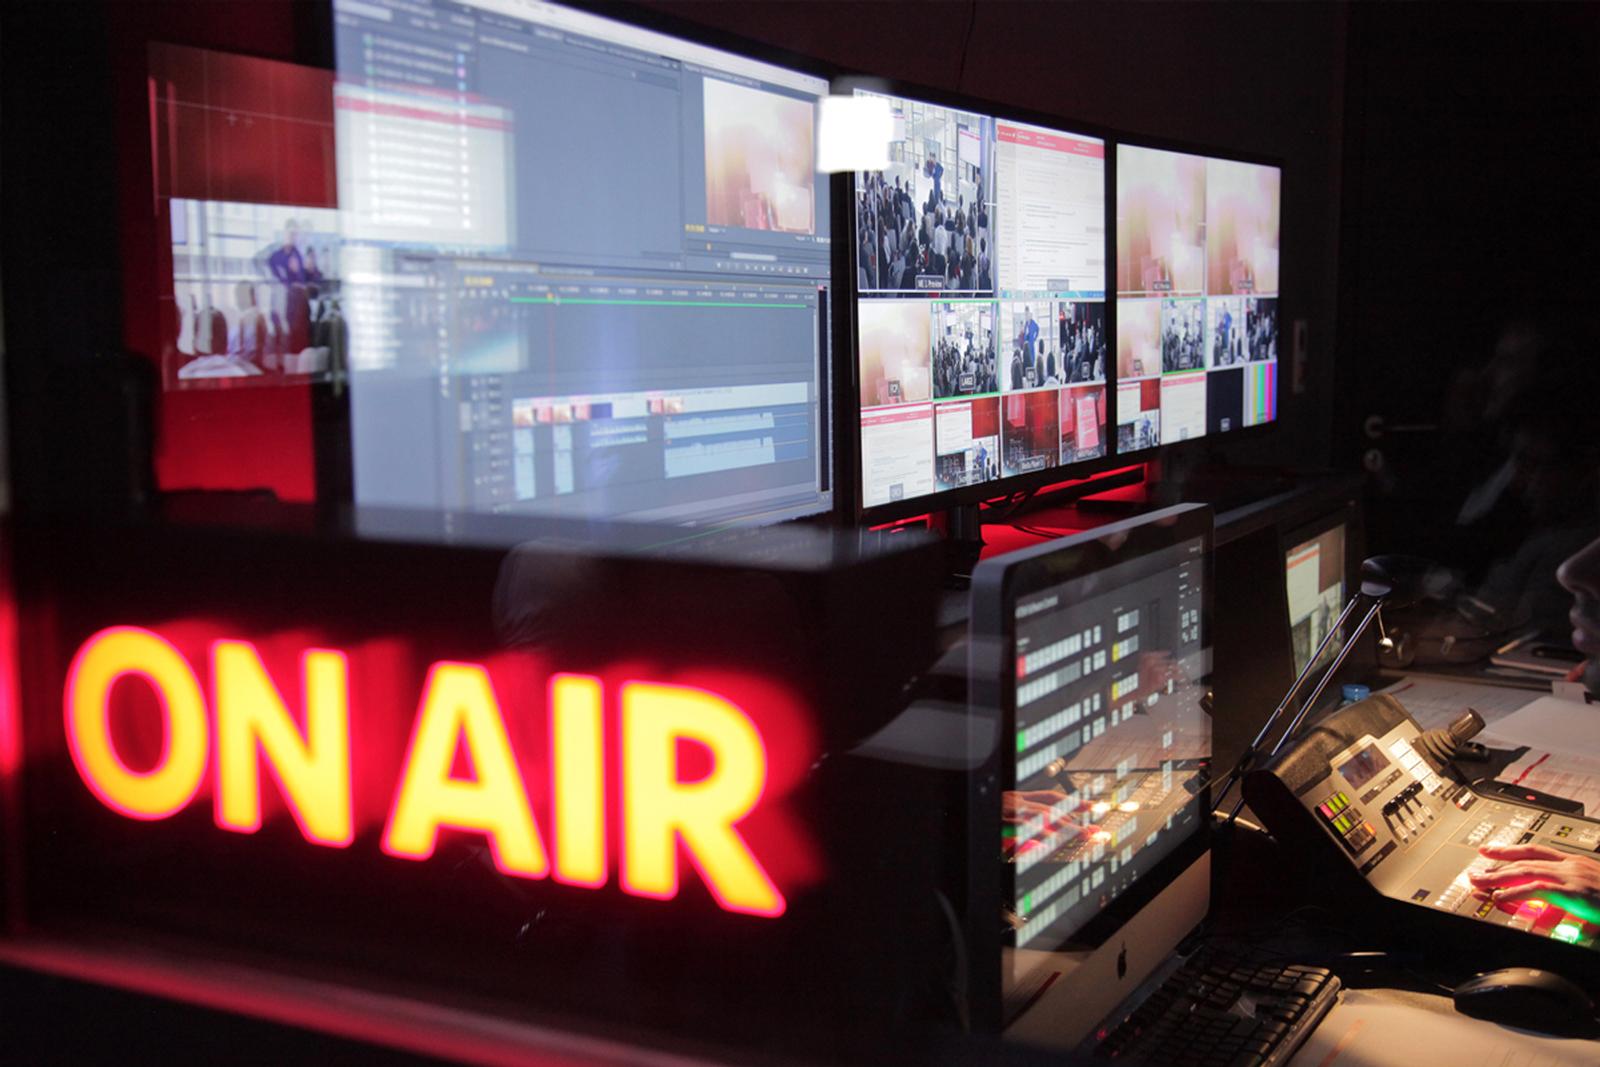 Le live streaming, une alternative aux restrictions